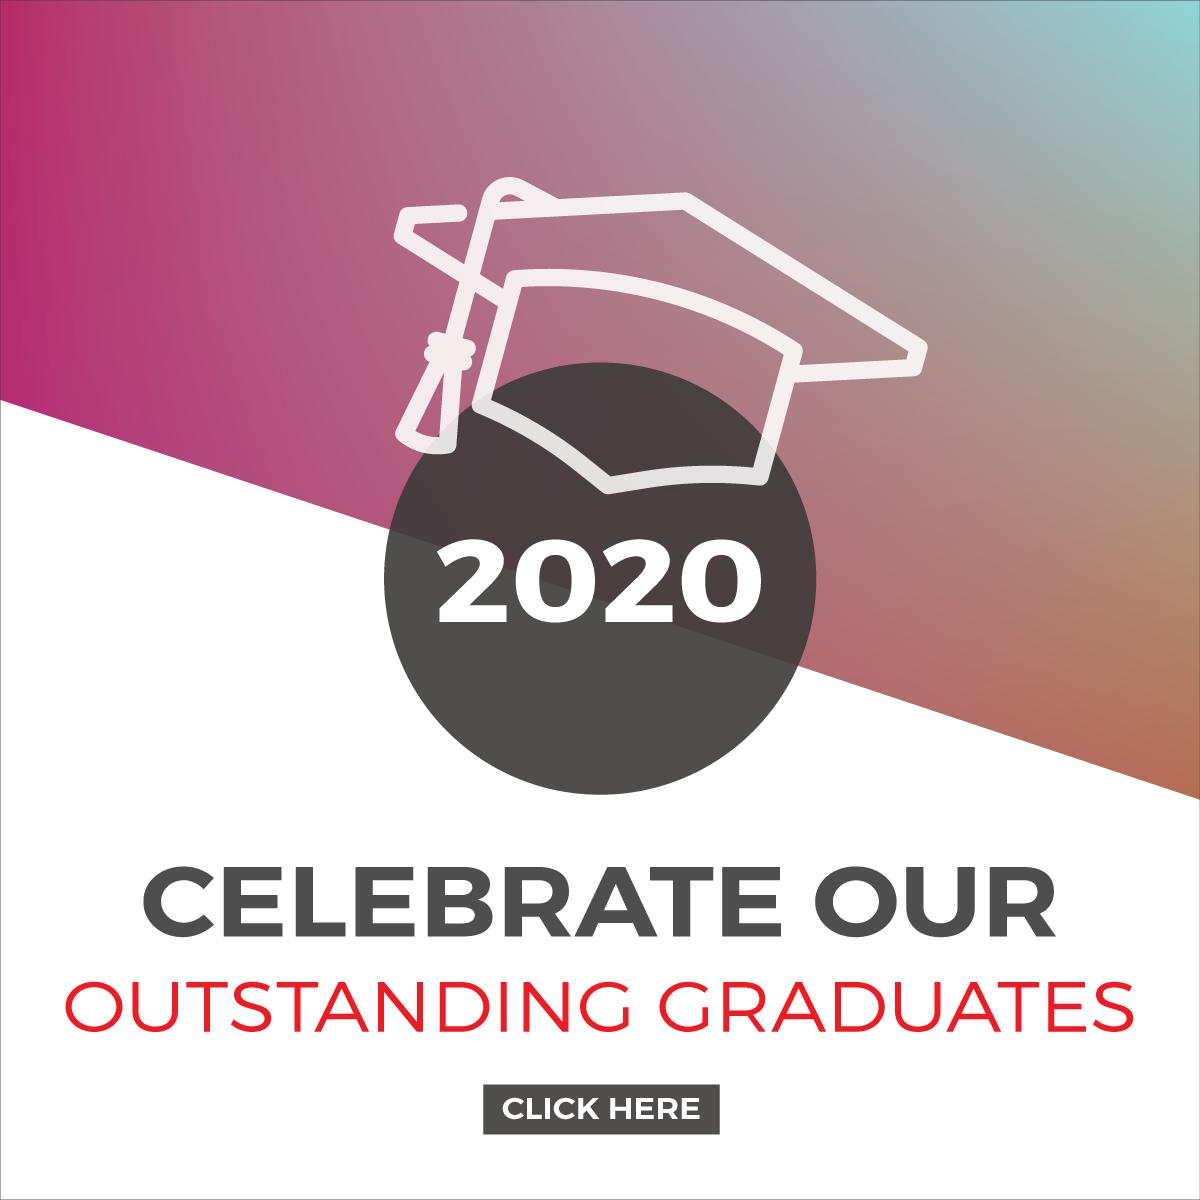 Outstanding 2020 Graduates